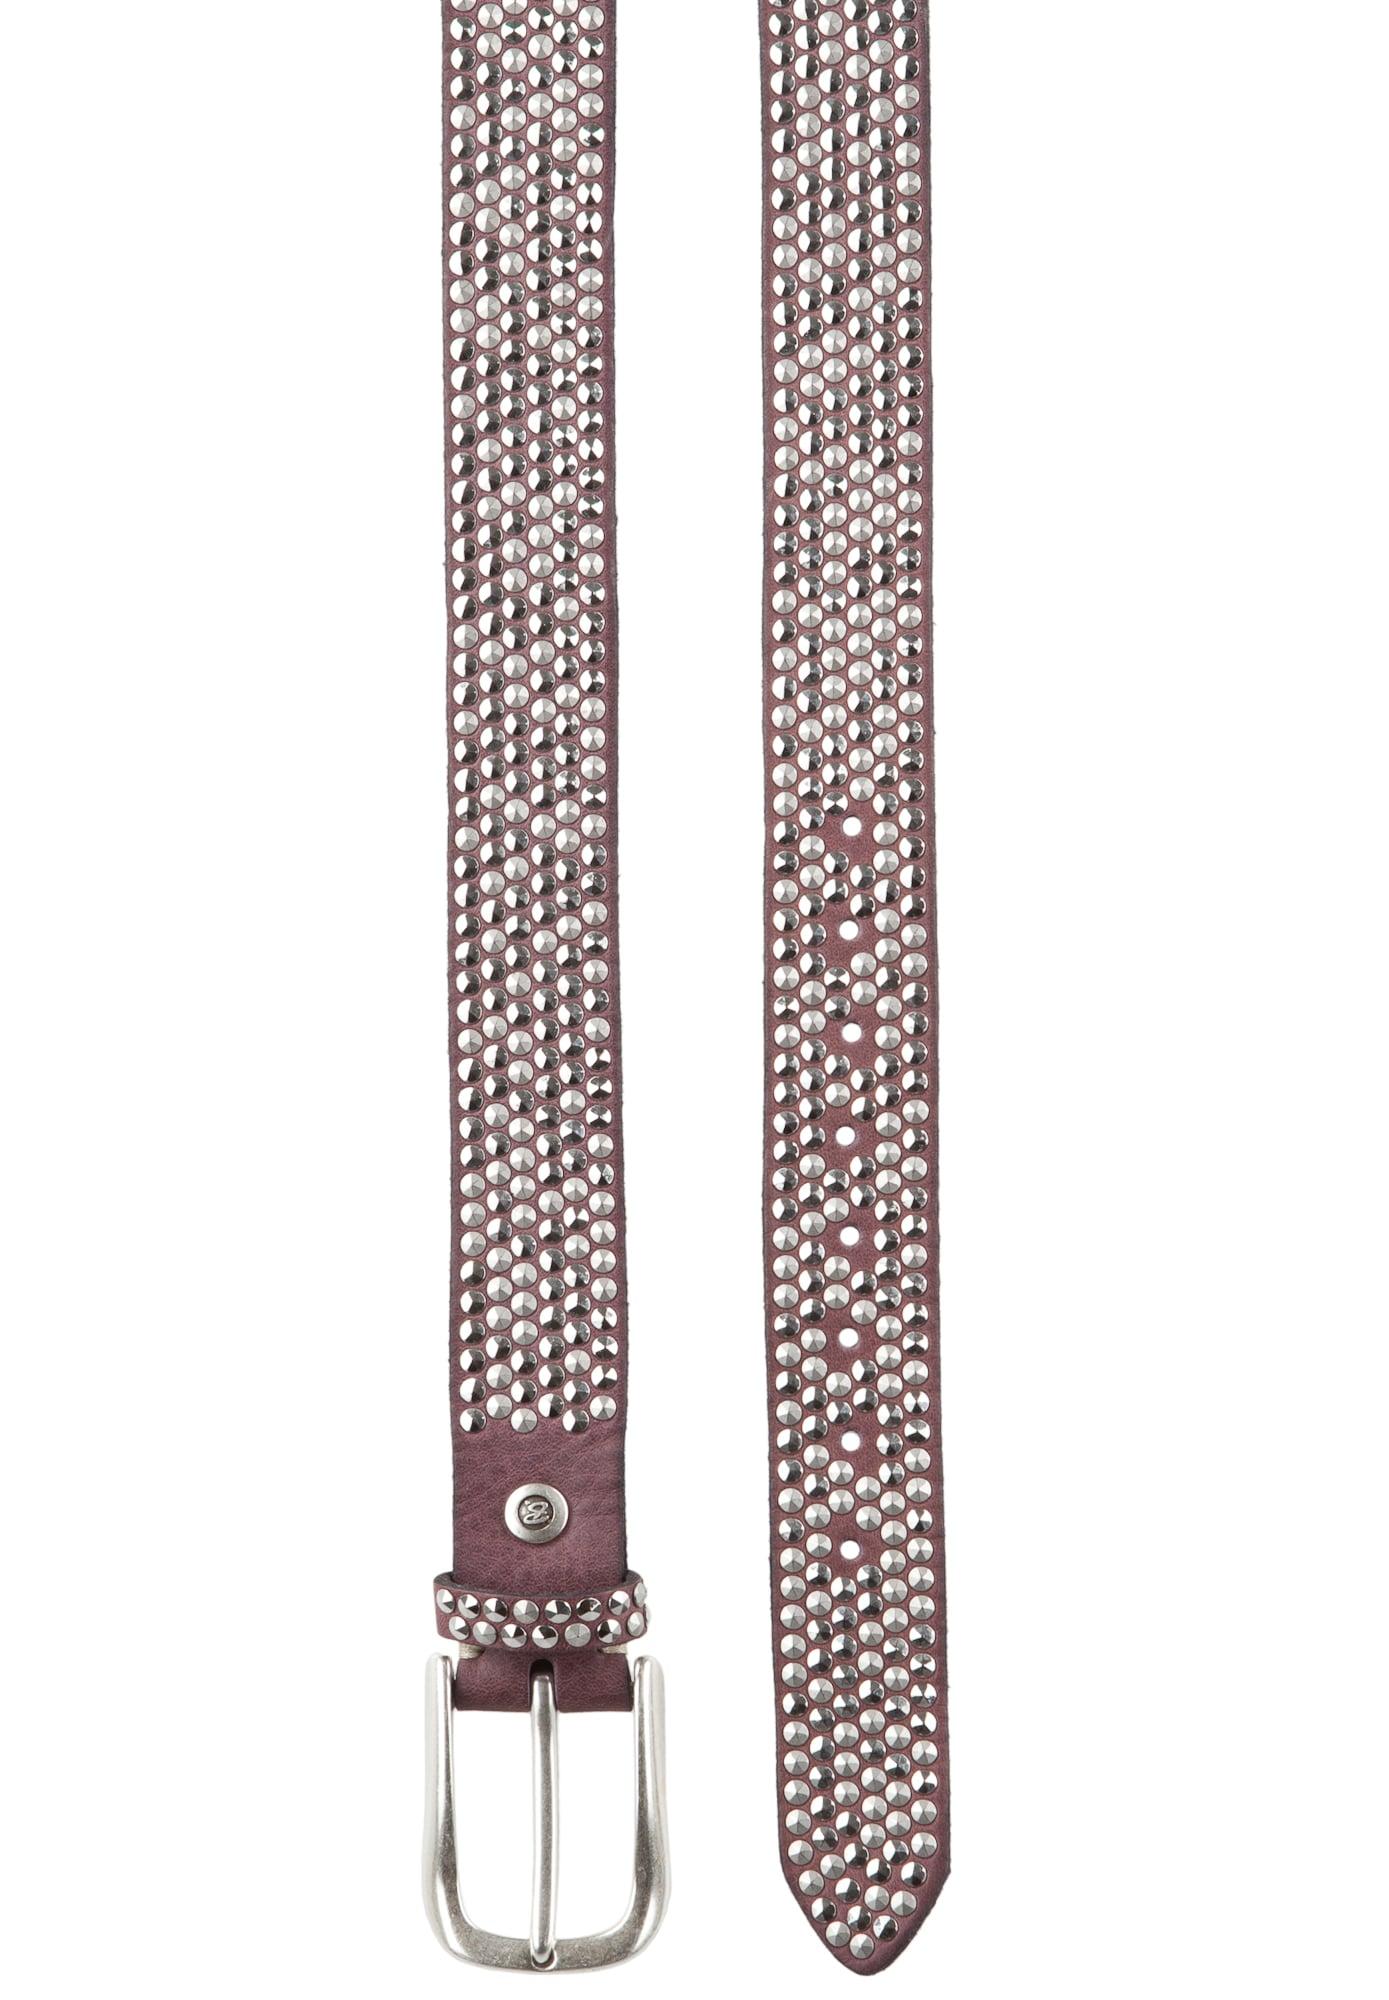 B.belt Handmade In Germany, Dames Riem, bessen